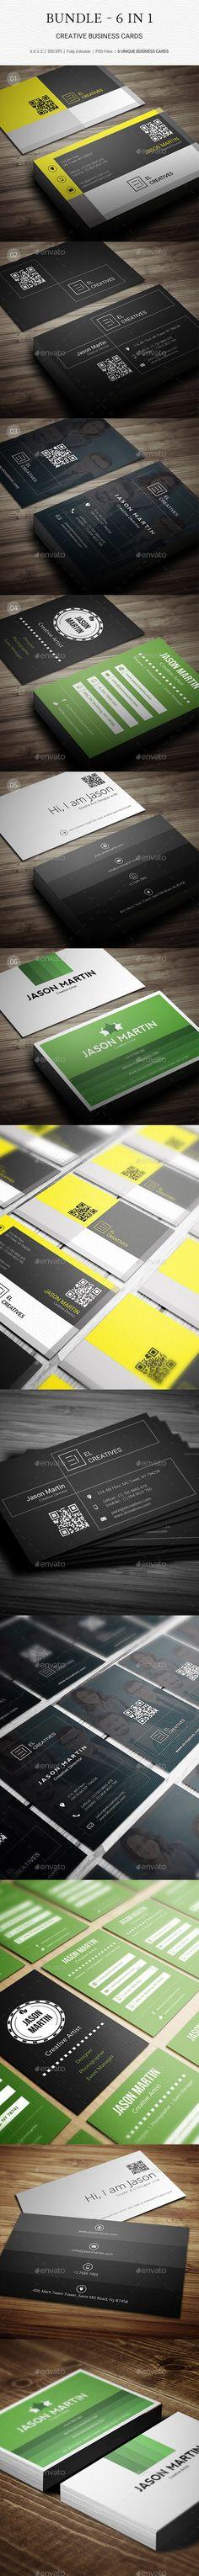 Bundle - Pro Corporate Business Cards - B42 - Corporate Business Cards